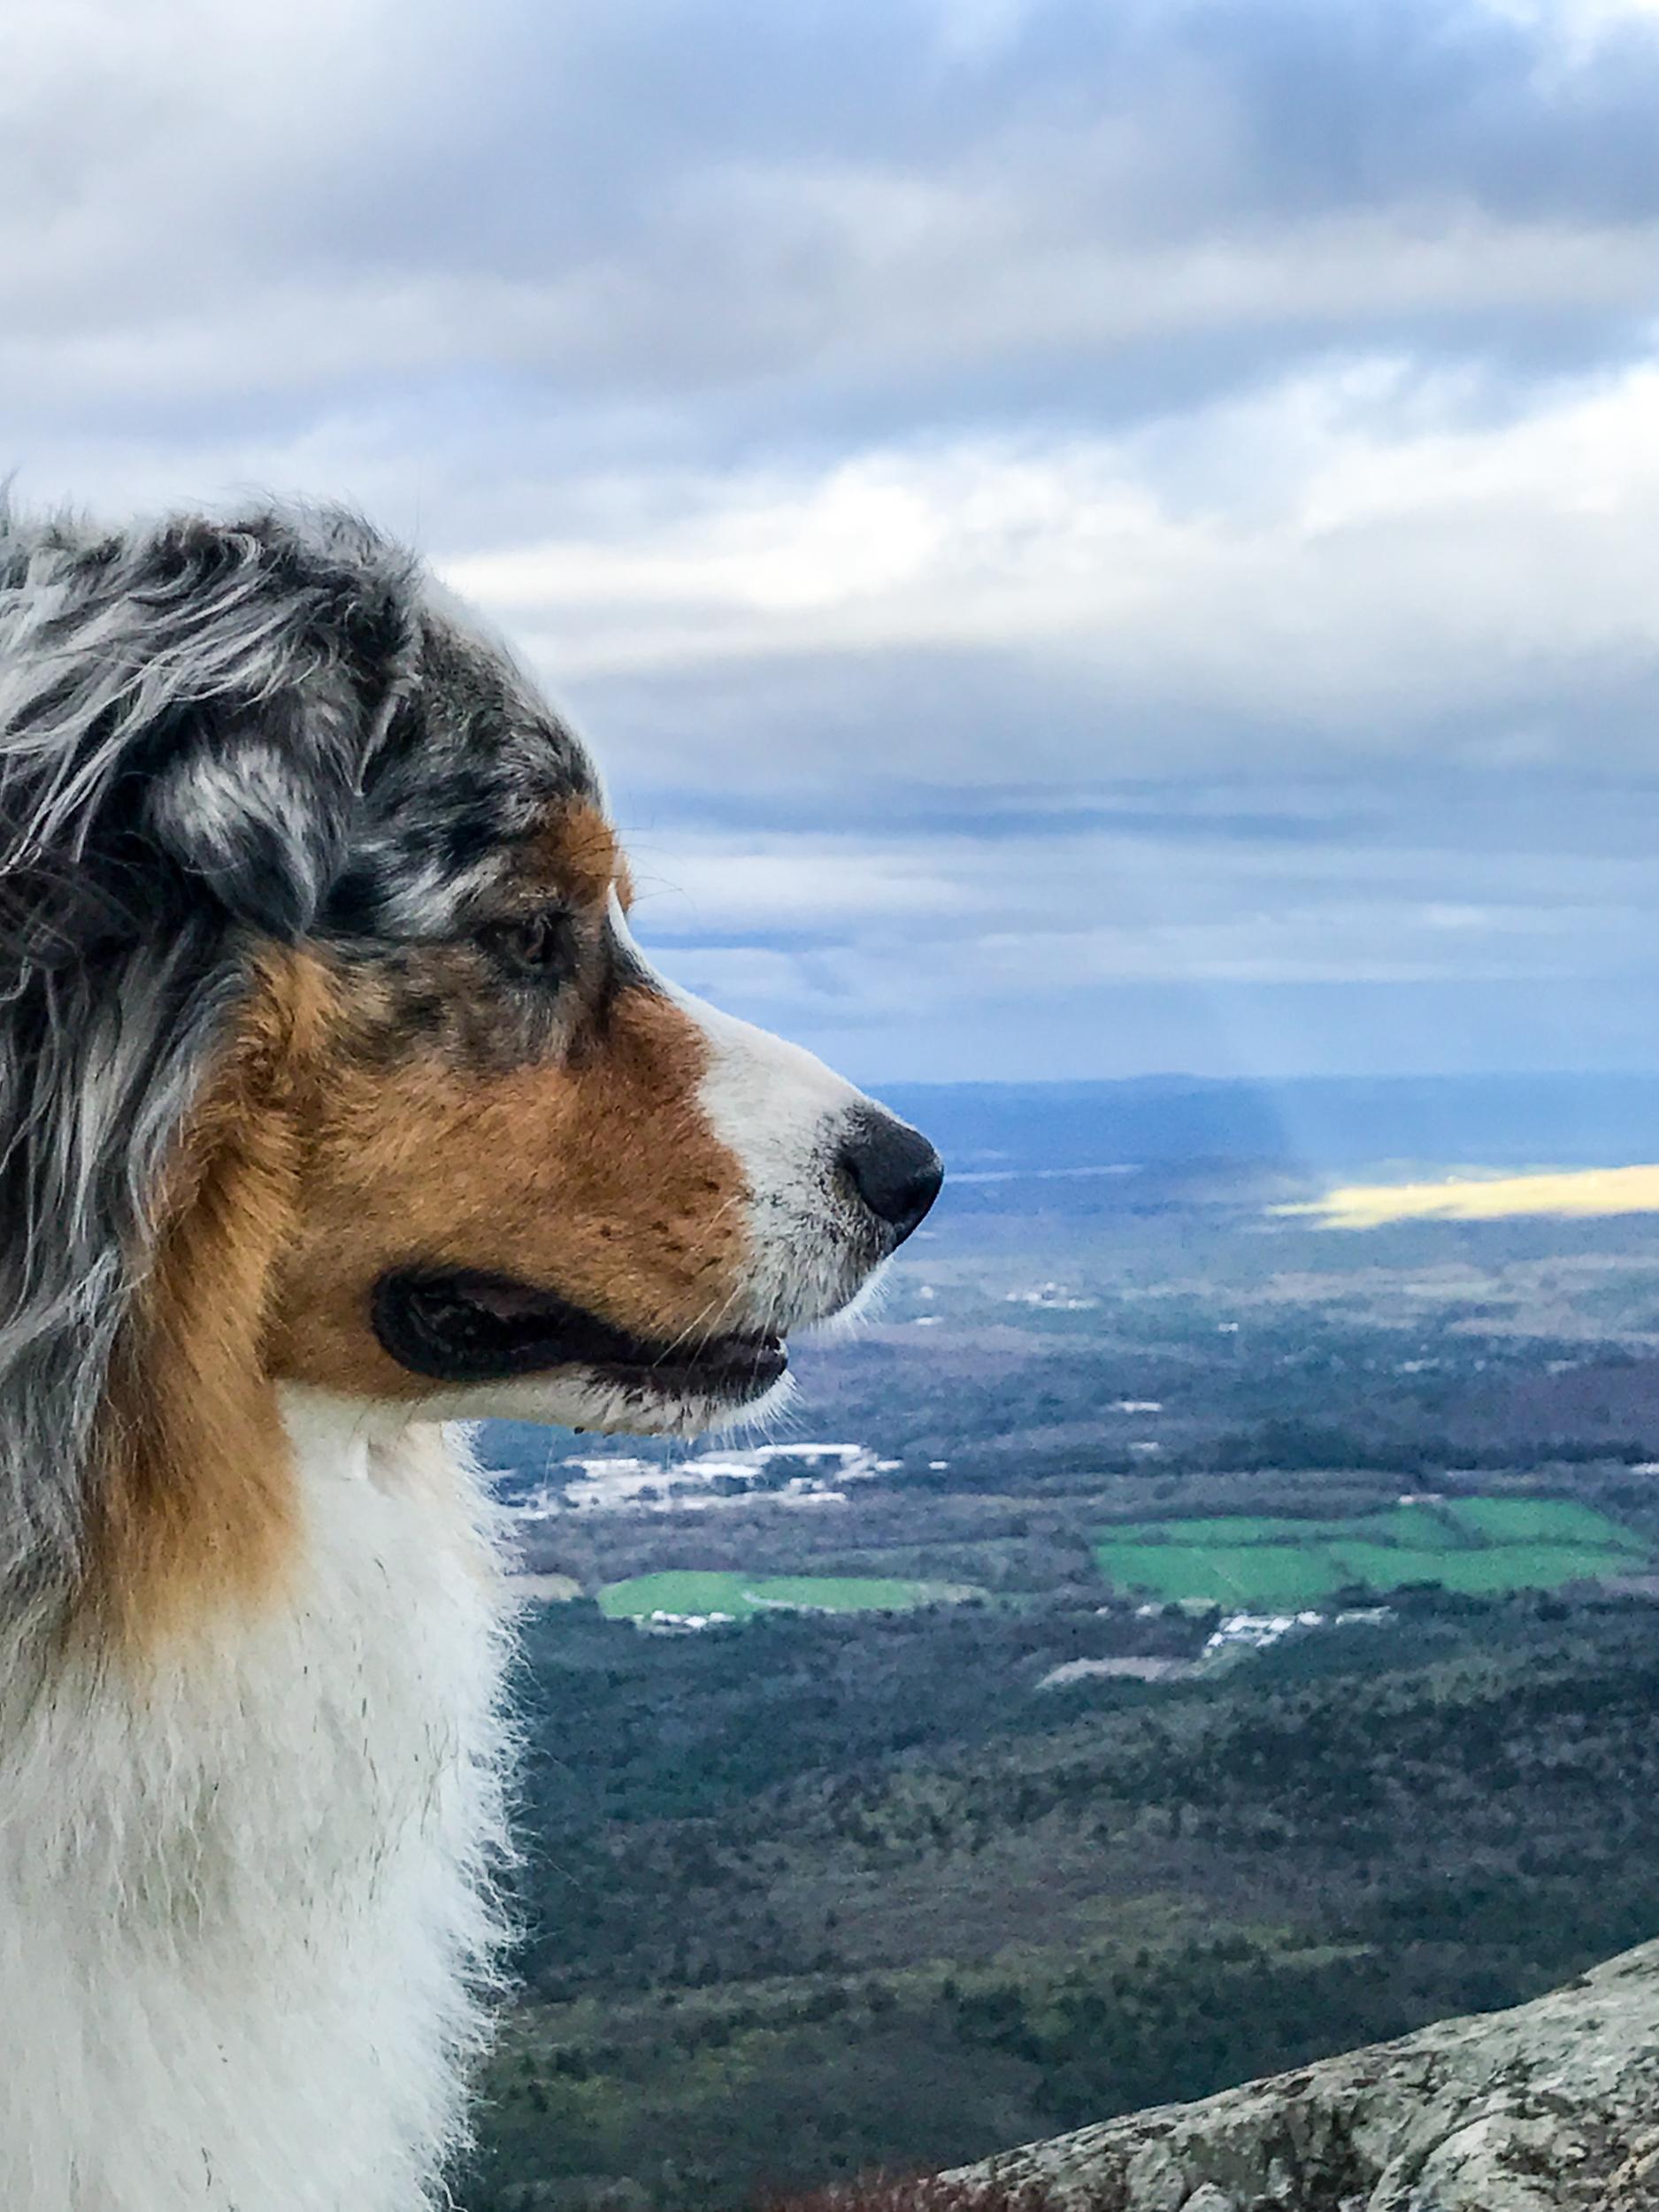 Squall overlooking Mount Washington Valley.